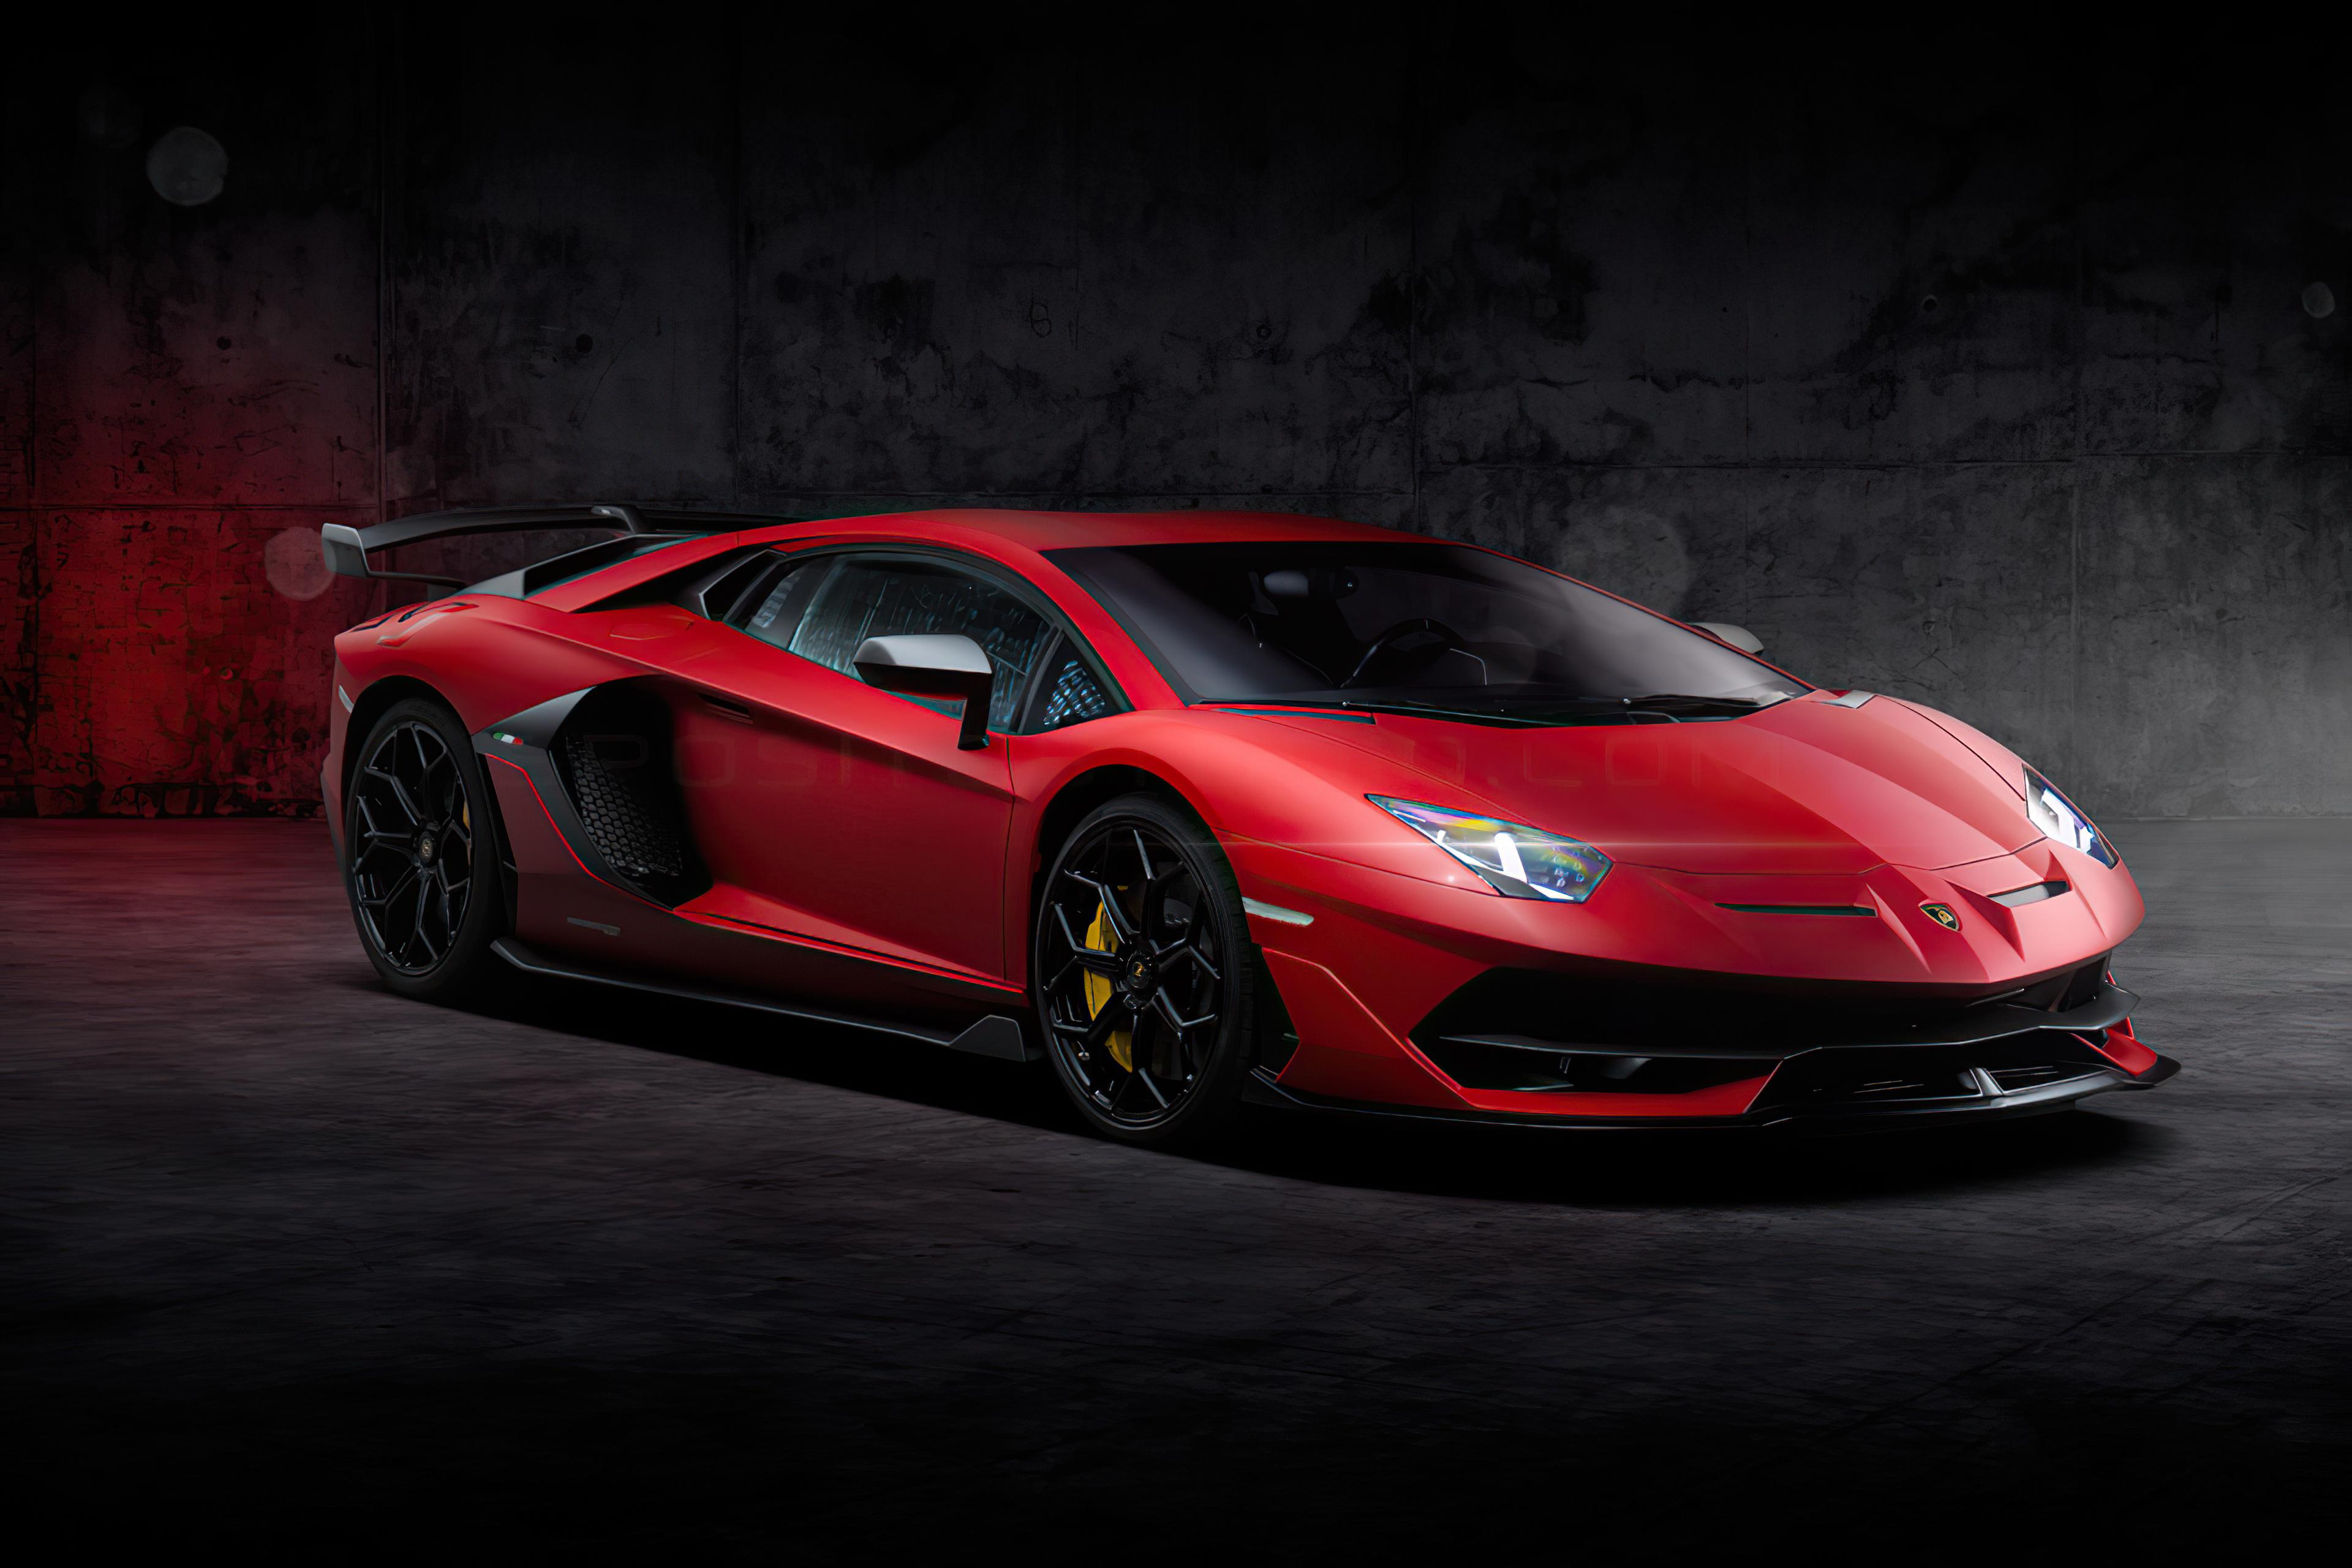 Red Lamborghini Aventador New, HD Cars, 4k Wallpapers ...